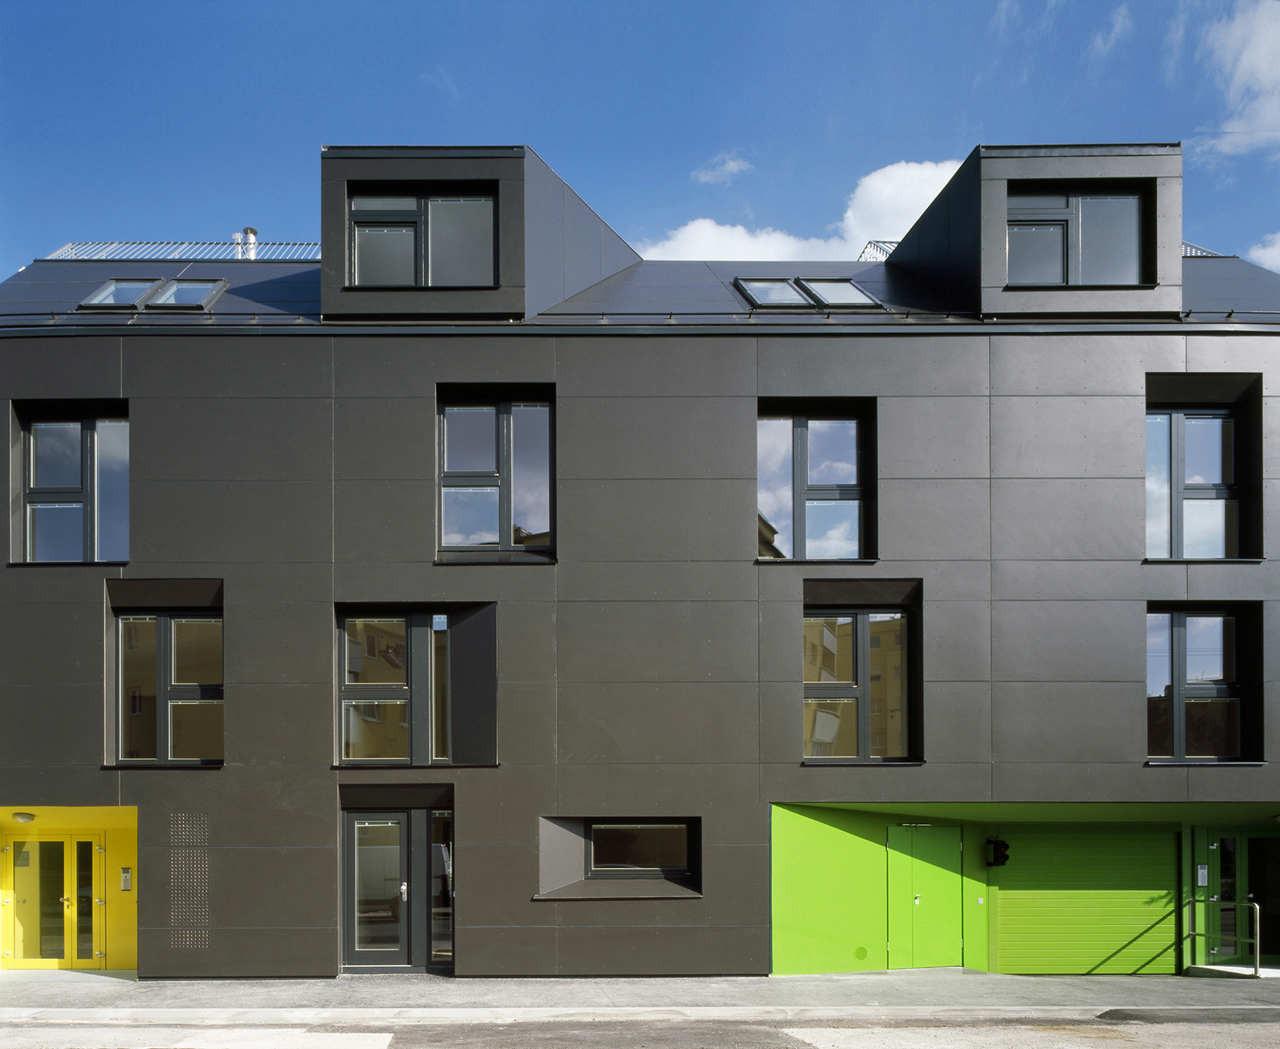 Welingergasse / Mladen Jadric Architects, © Pez Hejduk Architekturfotografie